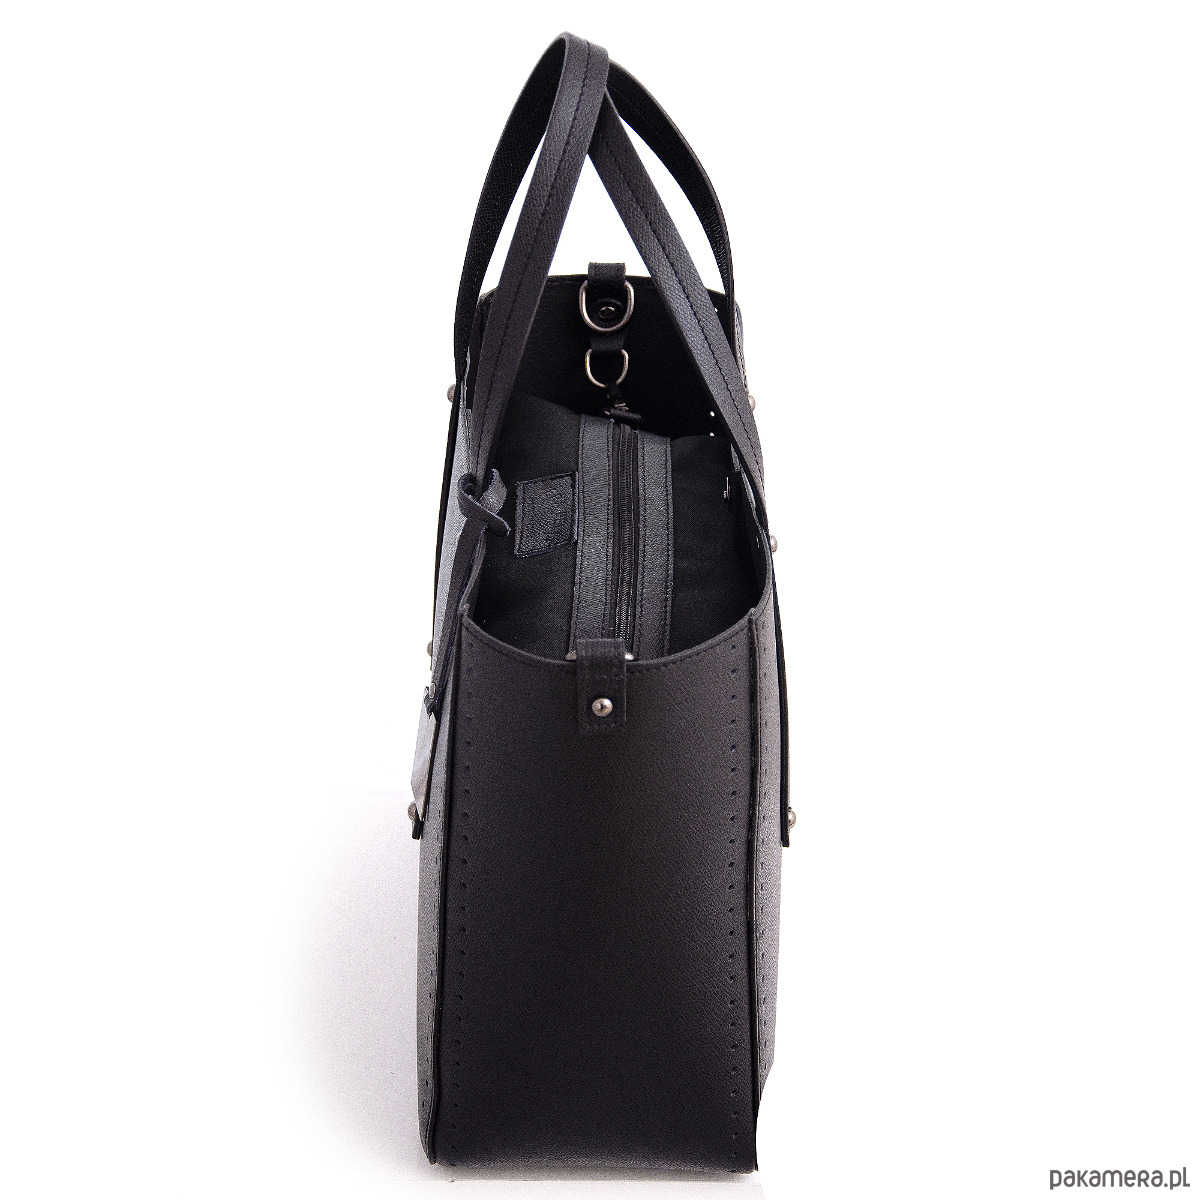 dcf09c7a5556b Torba skórzana SHOPPER z odpinanym paskiem - torebki do ręki ...